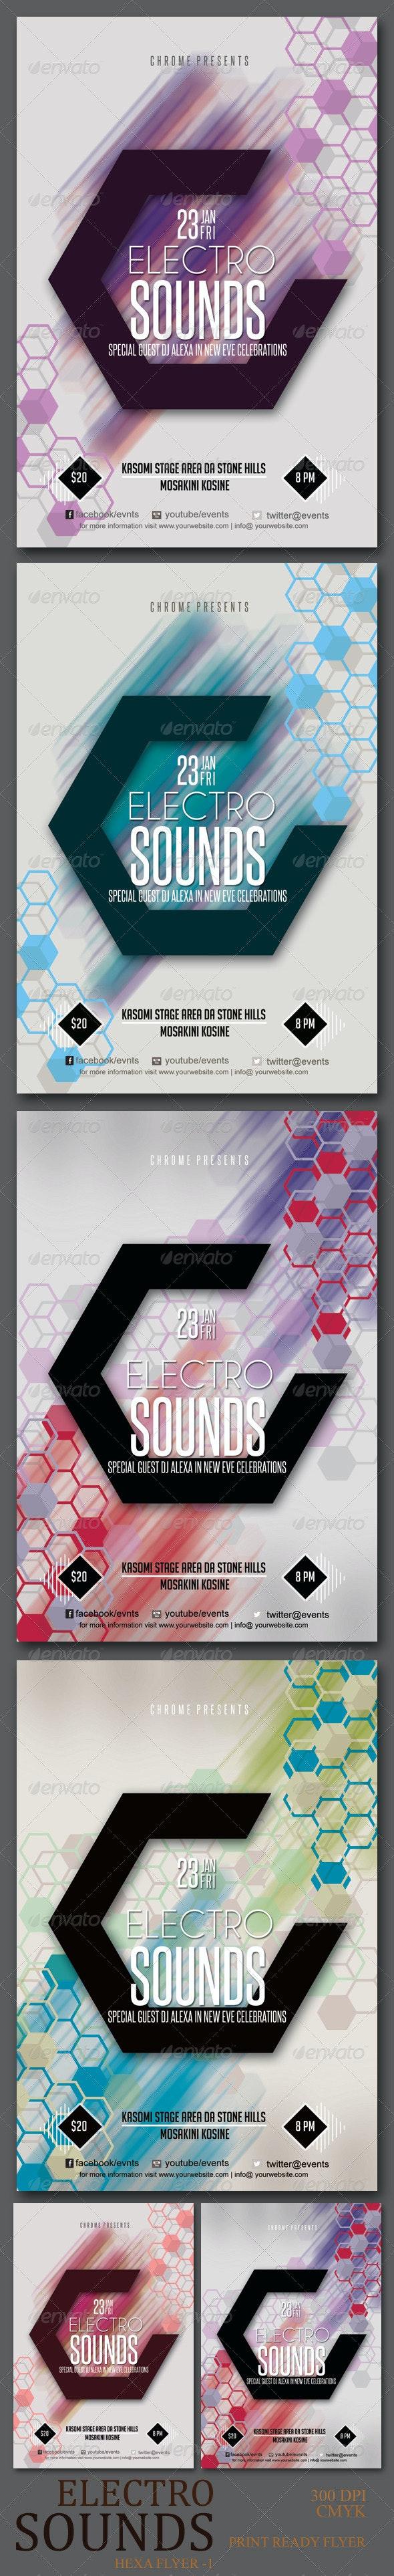 Electro Sounds Hexagon Flyer - Corporate Flyers